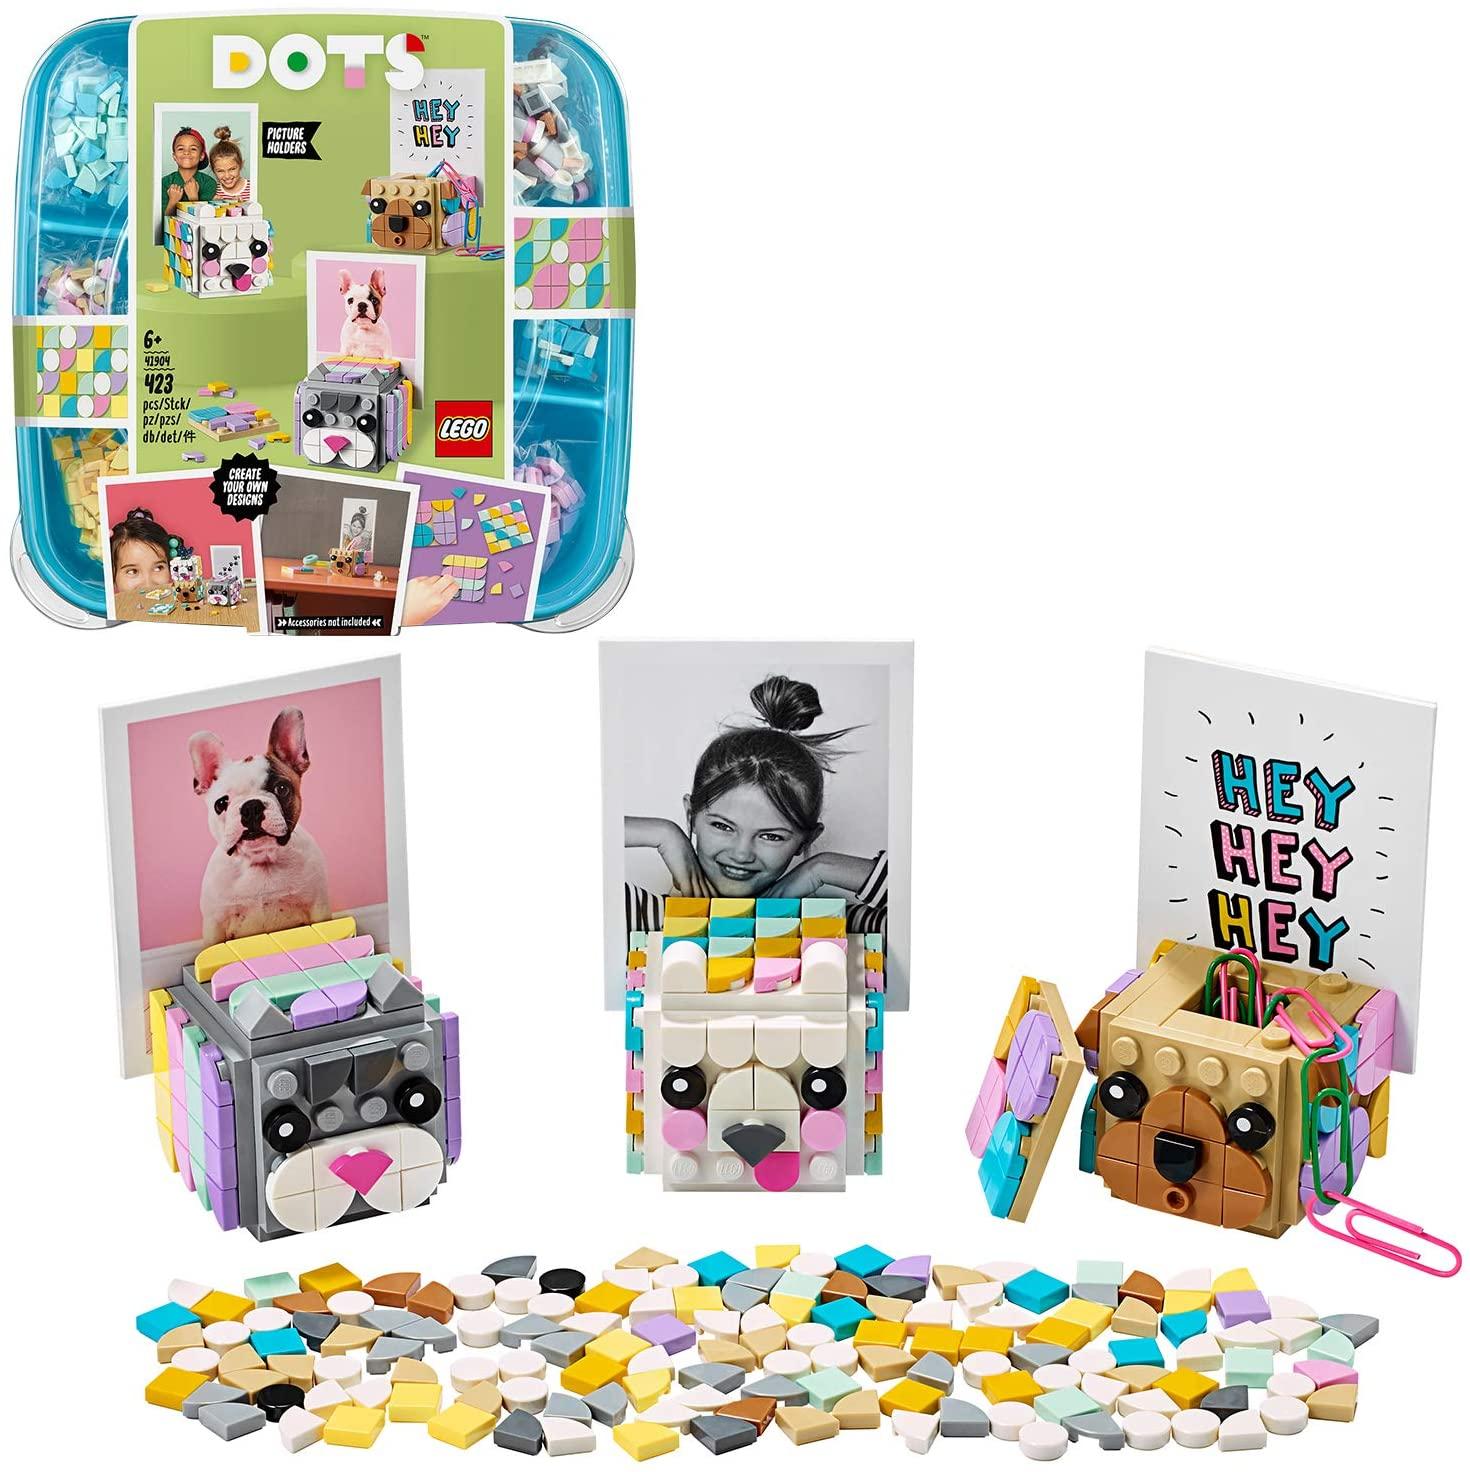 LEGO 41904 DOTS Animal Picture Holders DIY Desk Accessories Decorations Set for £7.98 (Prime) / £12.47 (Non Prime) delivered @ Amazon